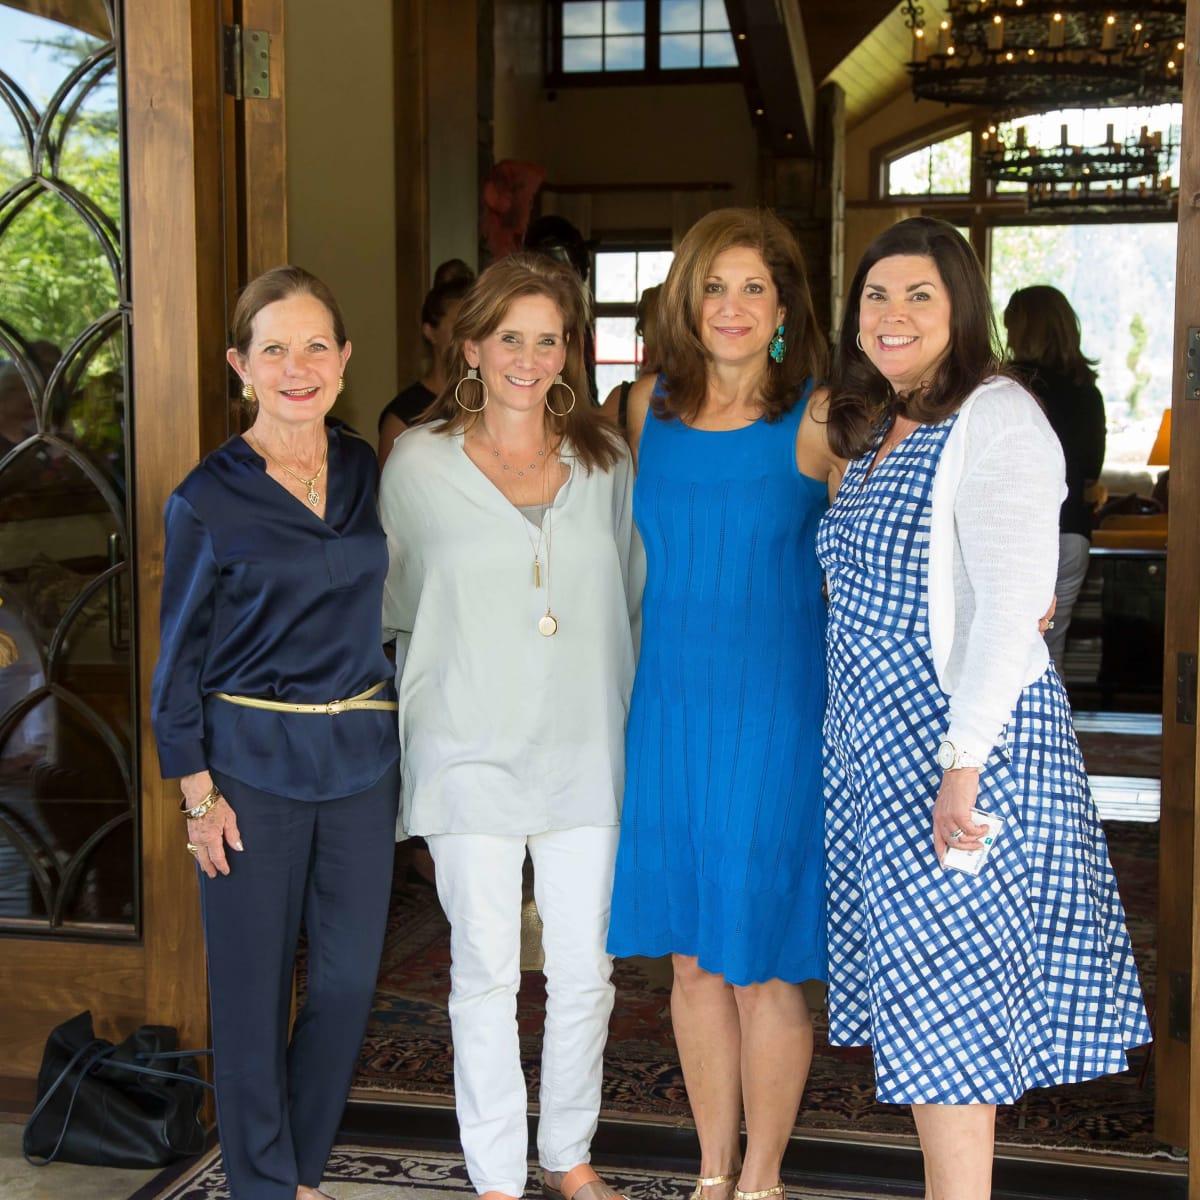 Houston Methodist in Aspen, July 2016, Hetta Heath, Anne Csorba, Kimberly Dominy, Lesha Elsenbrook